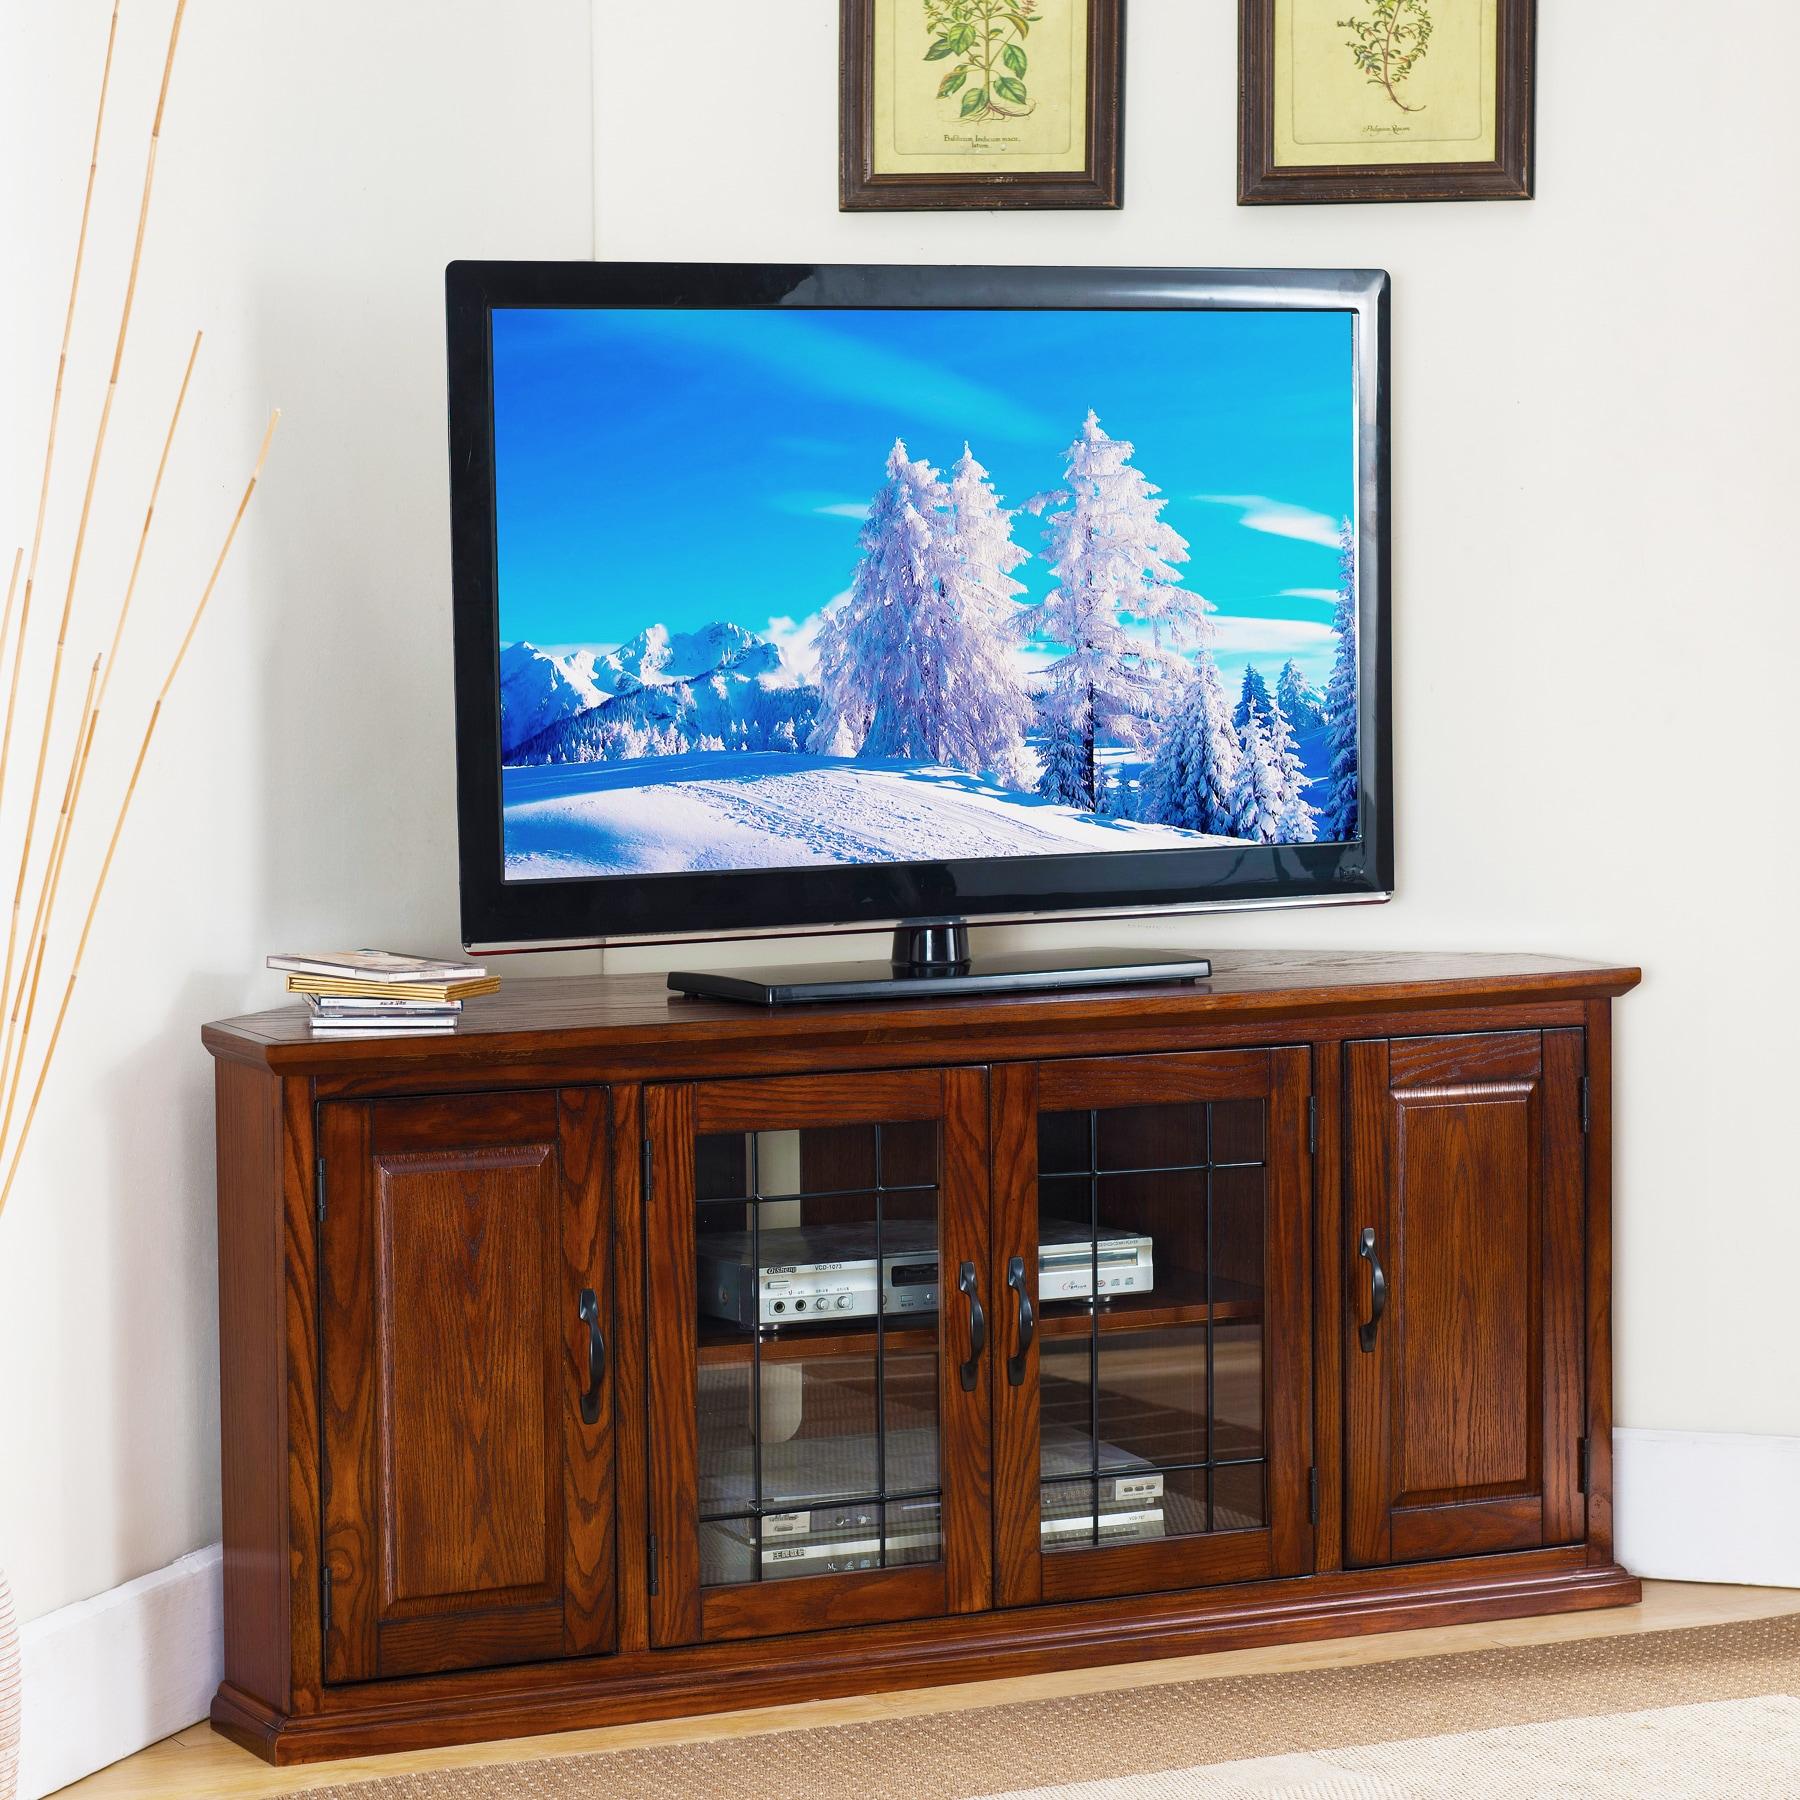 Shop Burnished Oak Finish Wood And Leaded Glass 56 Inch Corner Tv